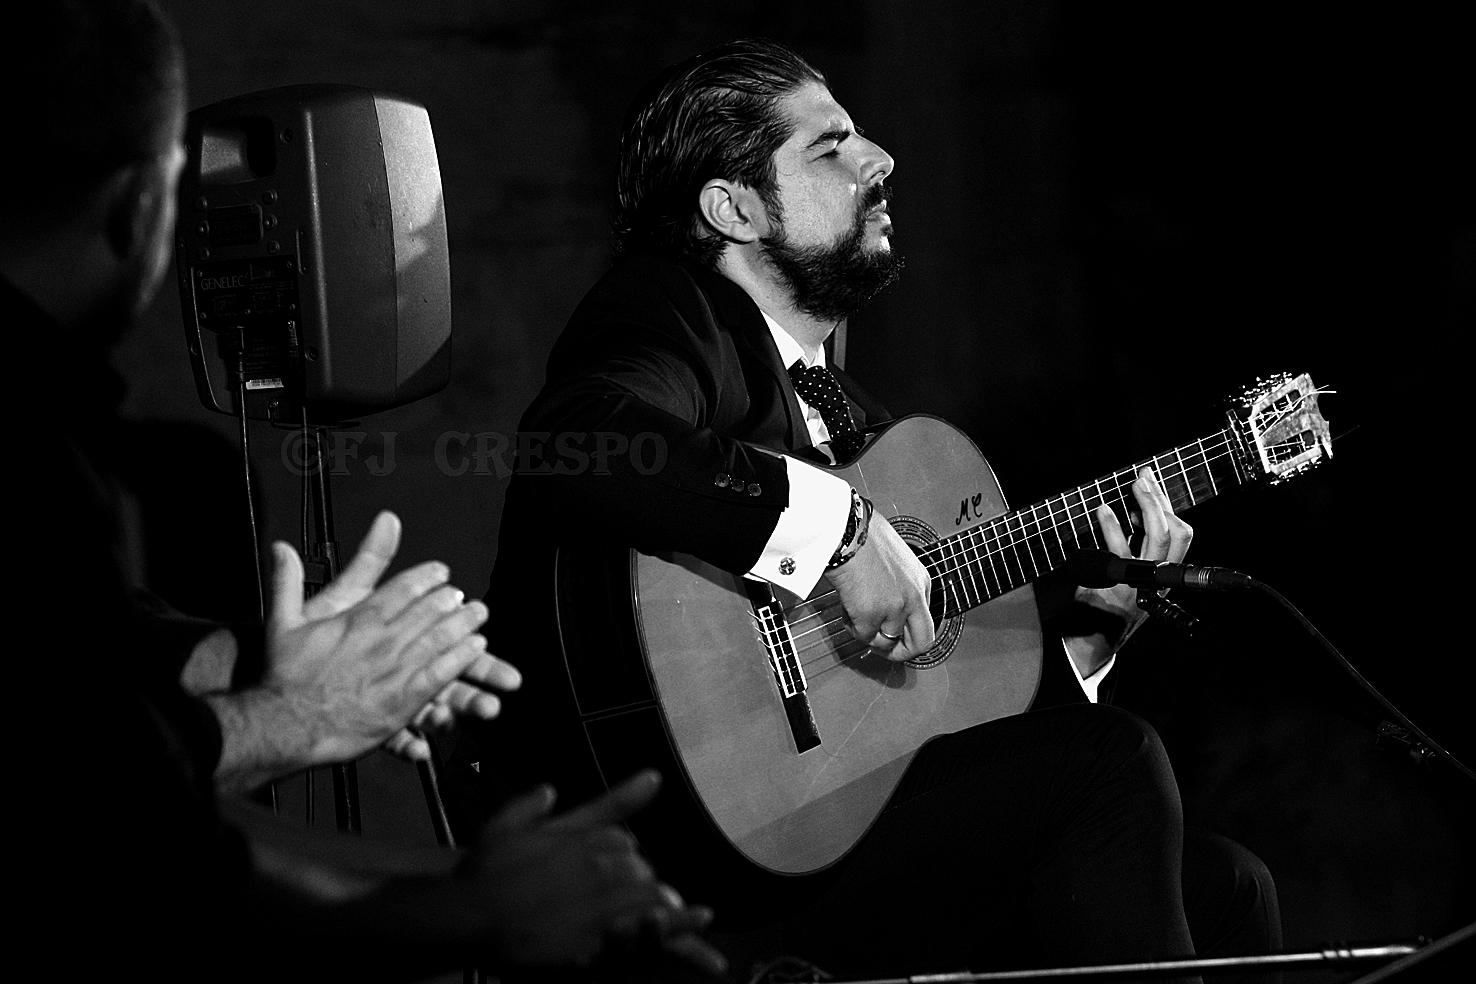 Recital de Manuel Valencia. XXX Noches de La Plazuela. Claustros de Santo Domingo, Jerez. 12 sep 2020. Foto: FJ Crespo